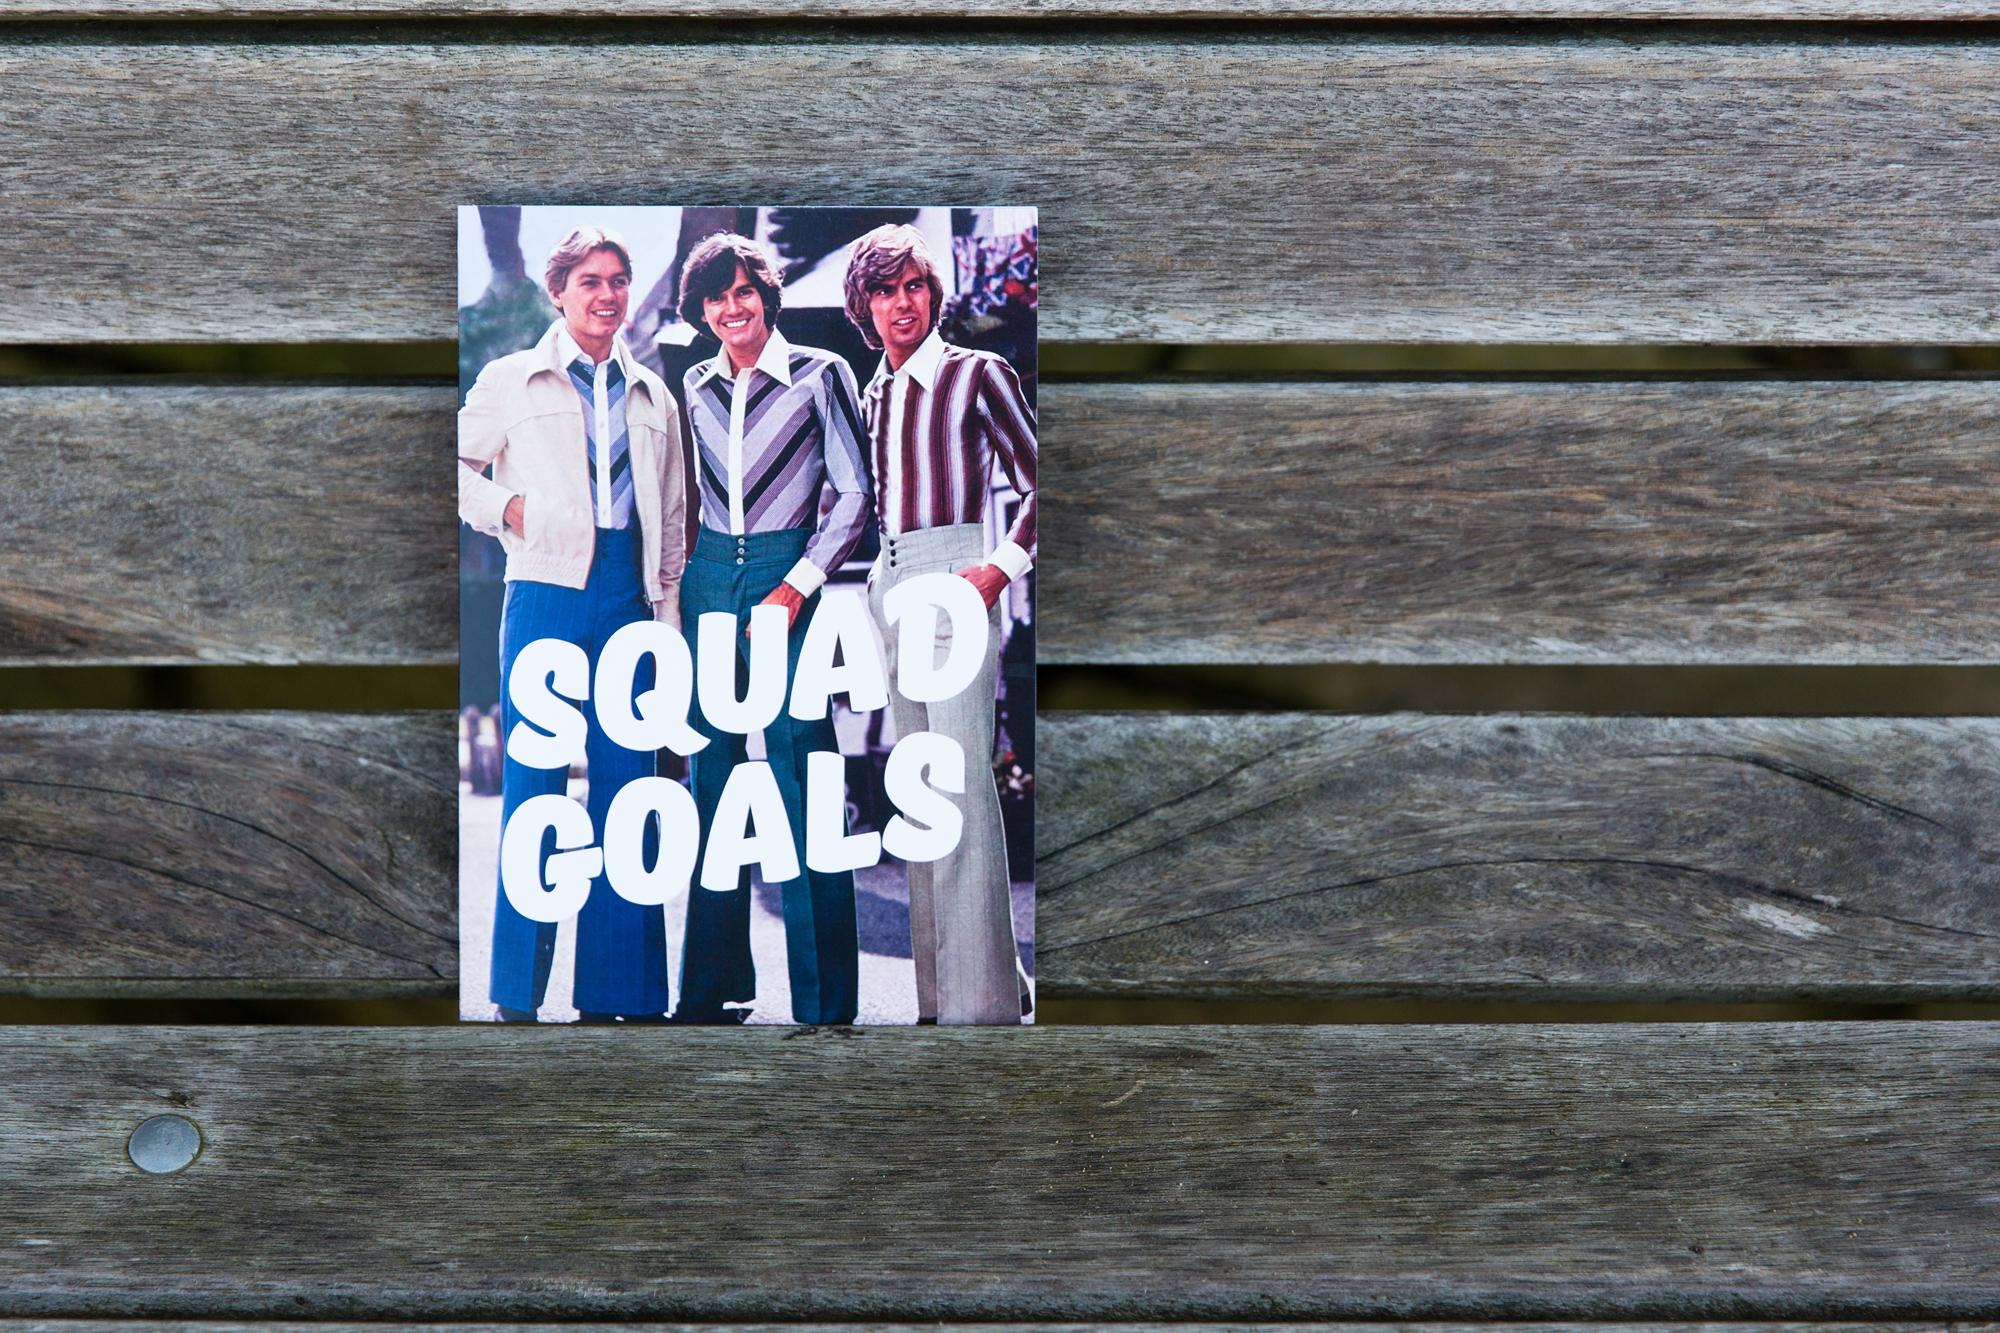 York Wedding Photography at Barmbyfield Barns squad goals card